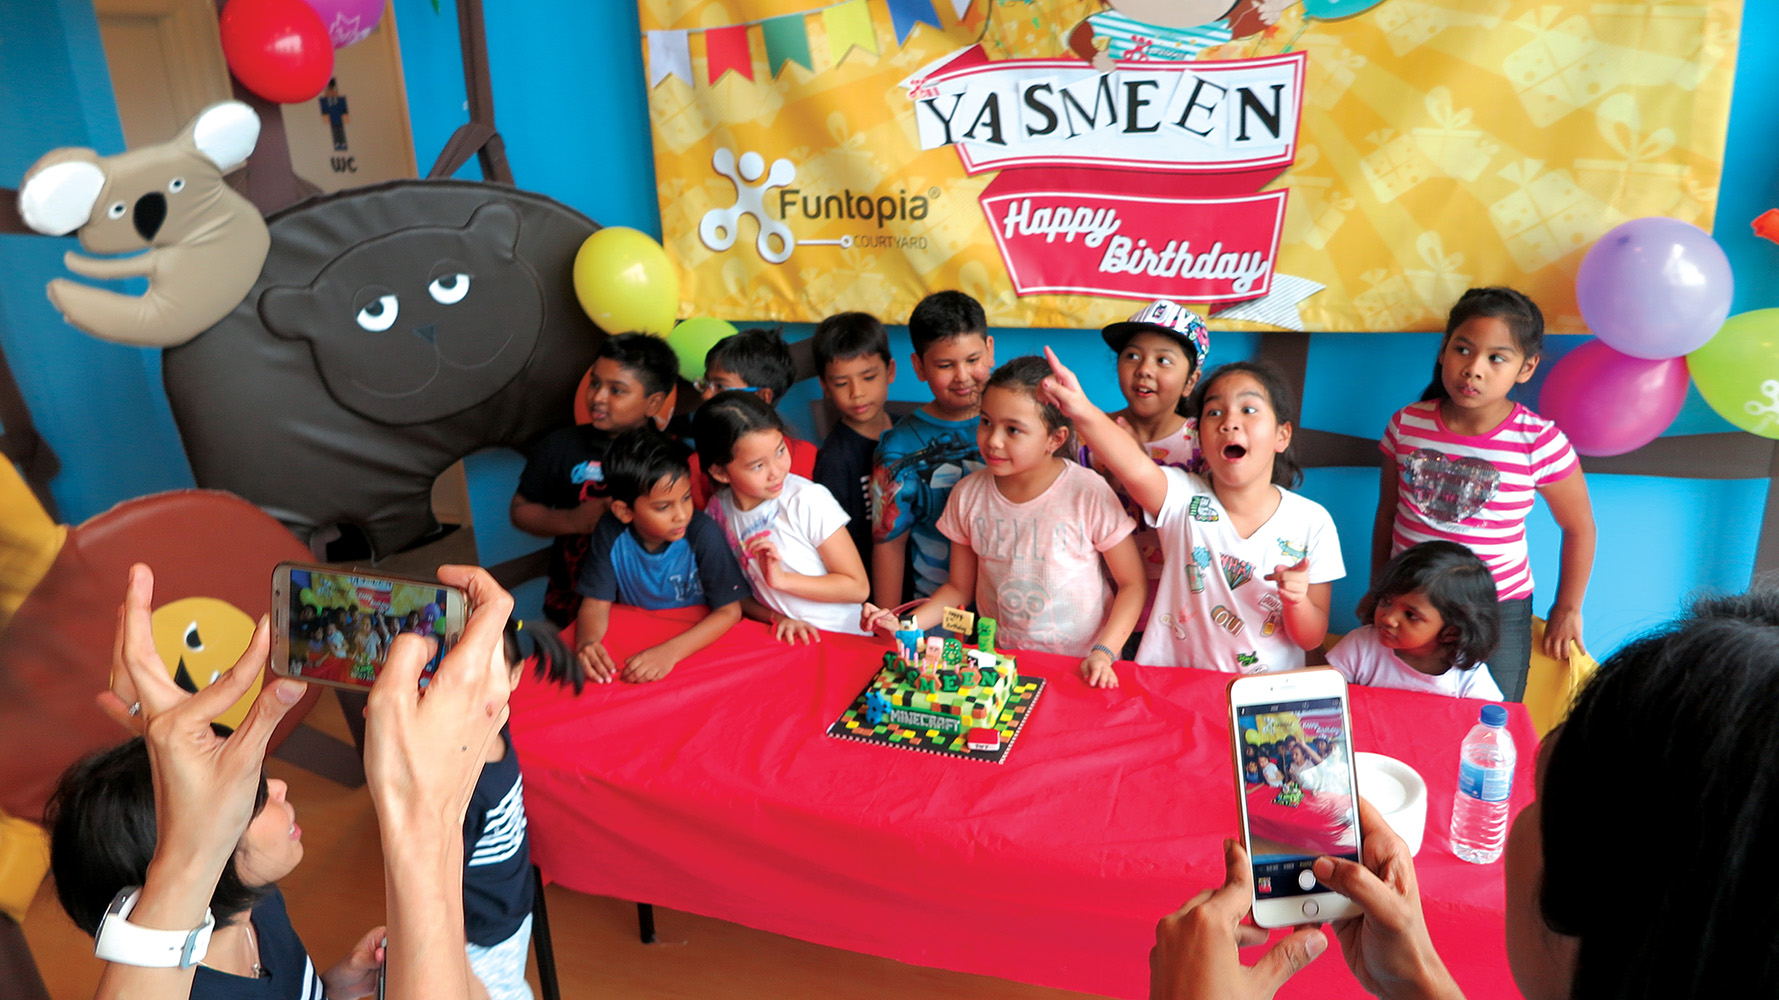 Birthday Party for kids in Kuala Lumpur Subang Jaya